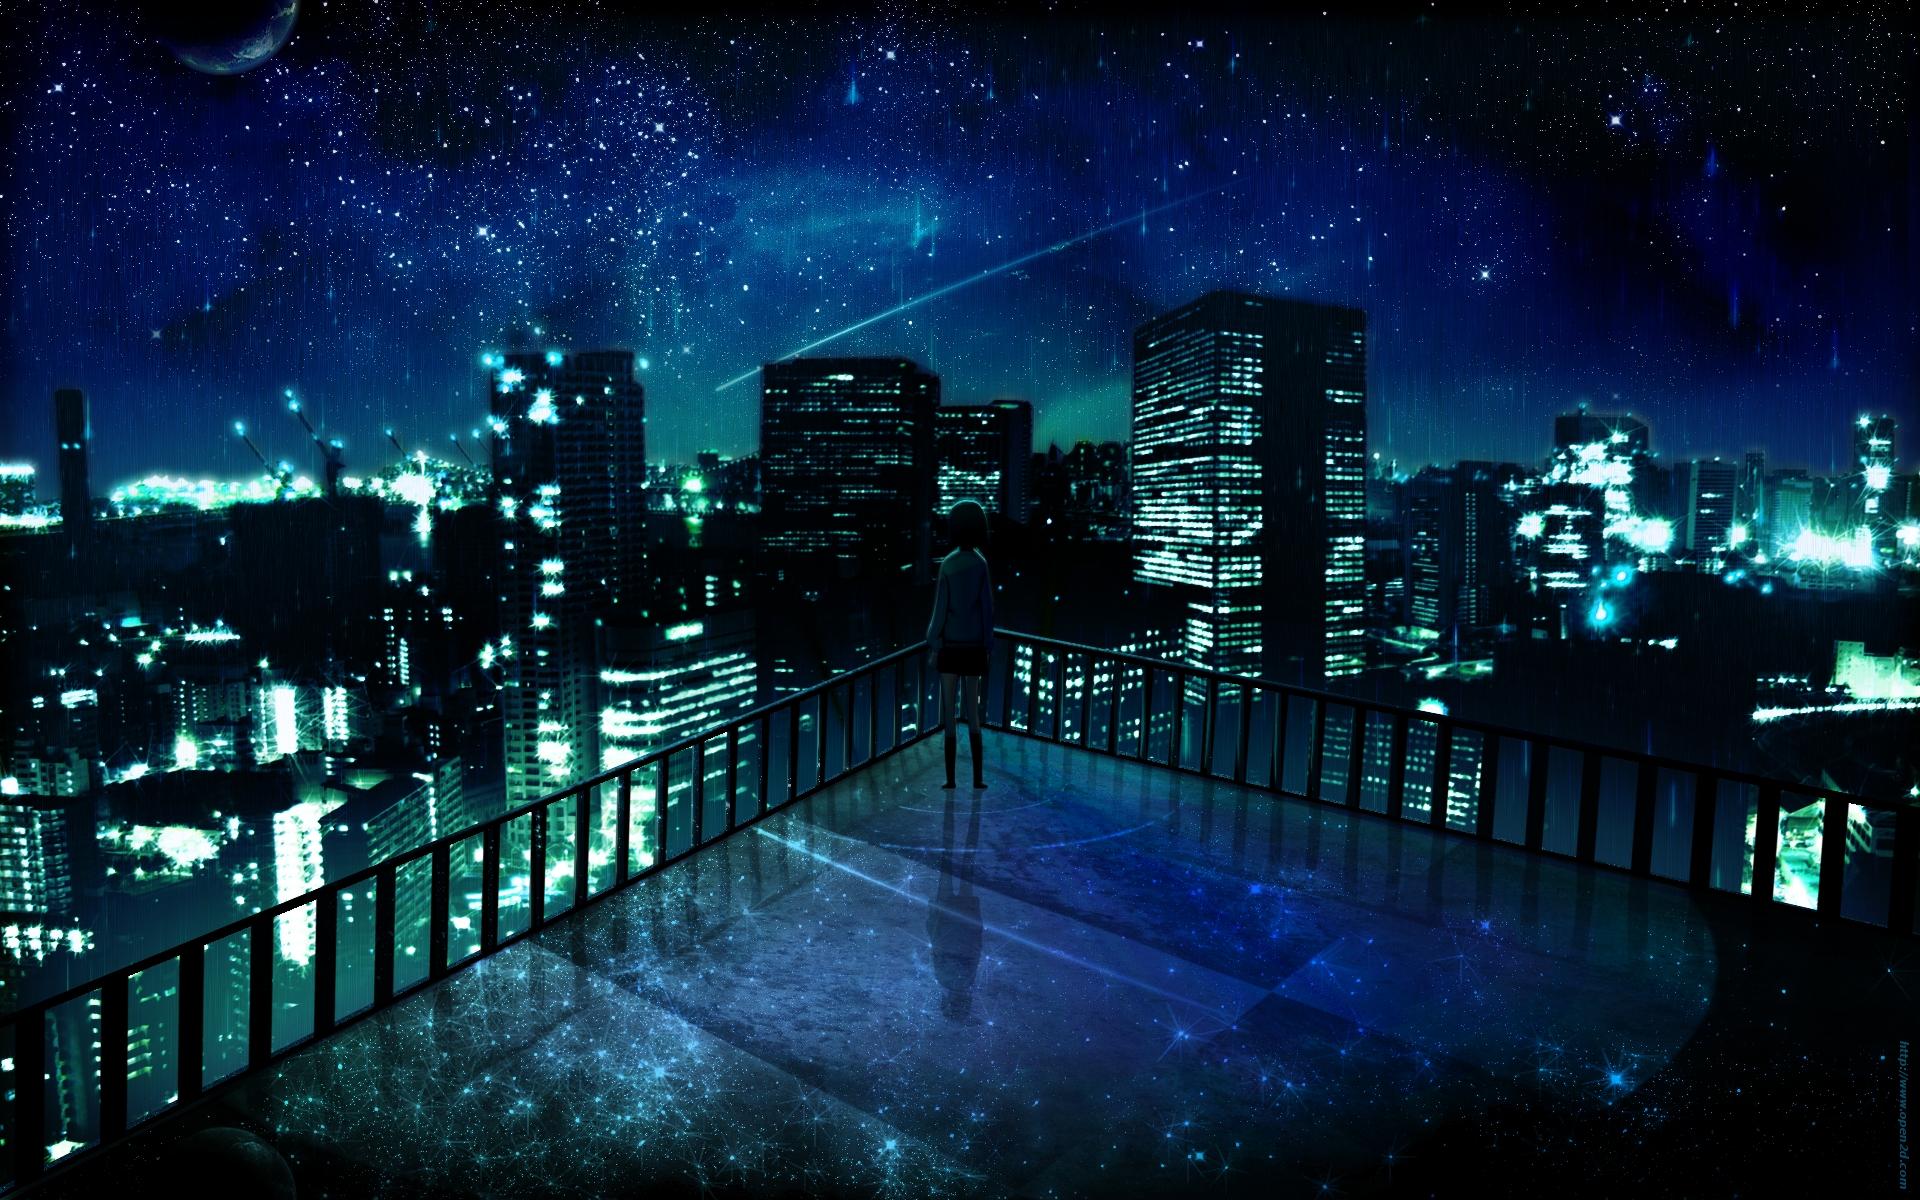 Image   Wallpaper manga 1920x1200 night cityjpg   Bleach Fan Fiction 1920x1200